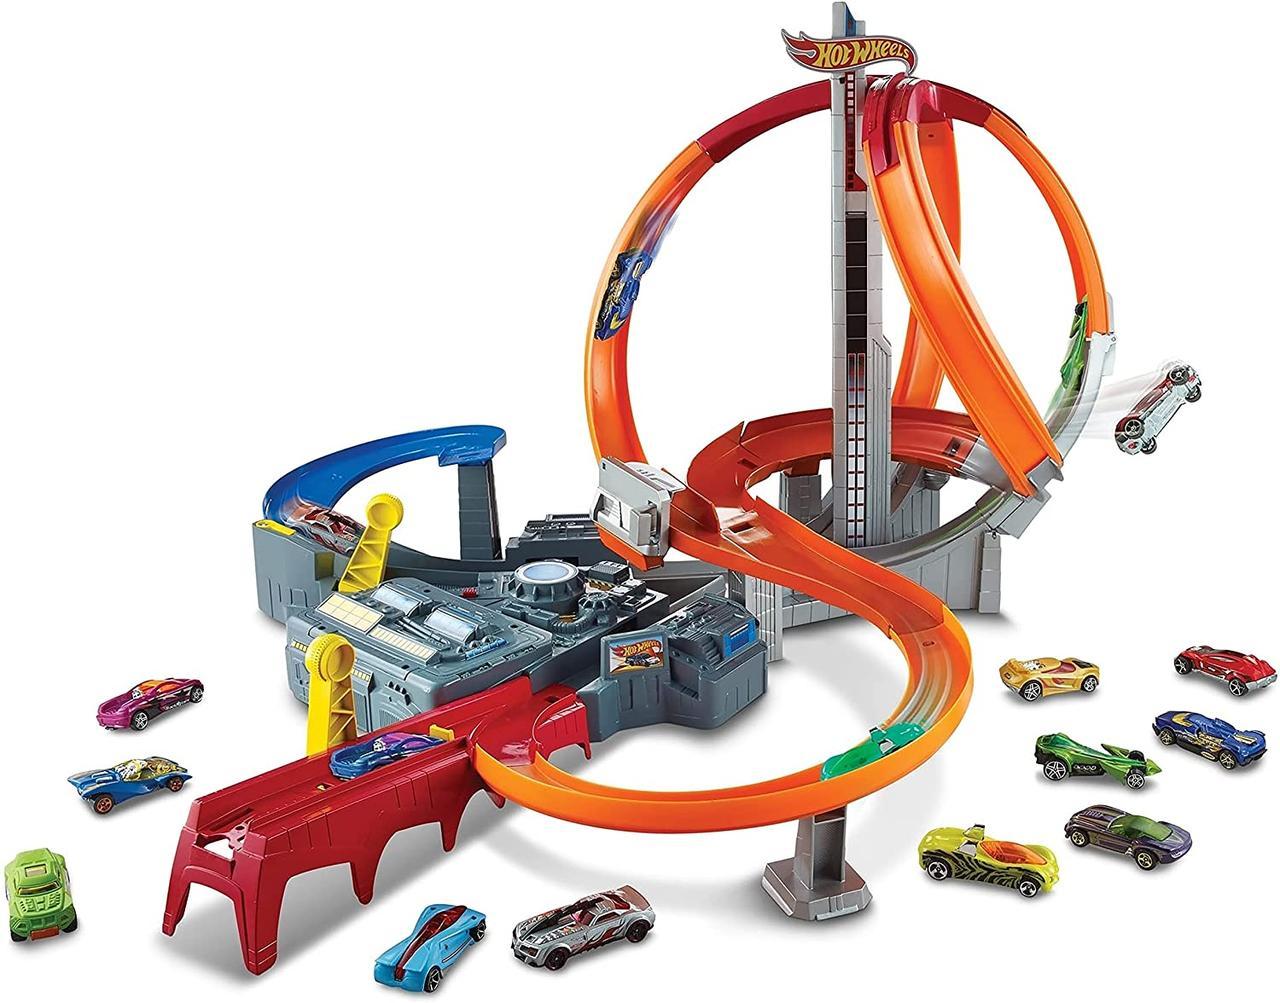 Трек Хот Вілс Запаморочливі віражі Hot Wheels Spin Storm Track Set CDL45